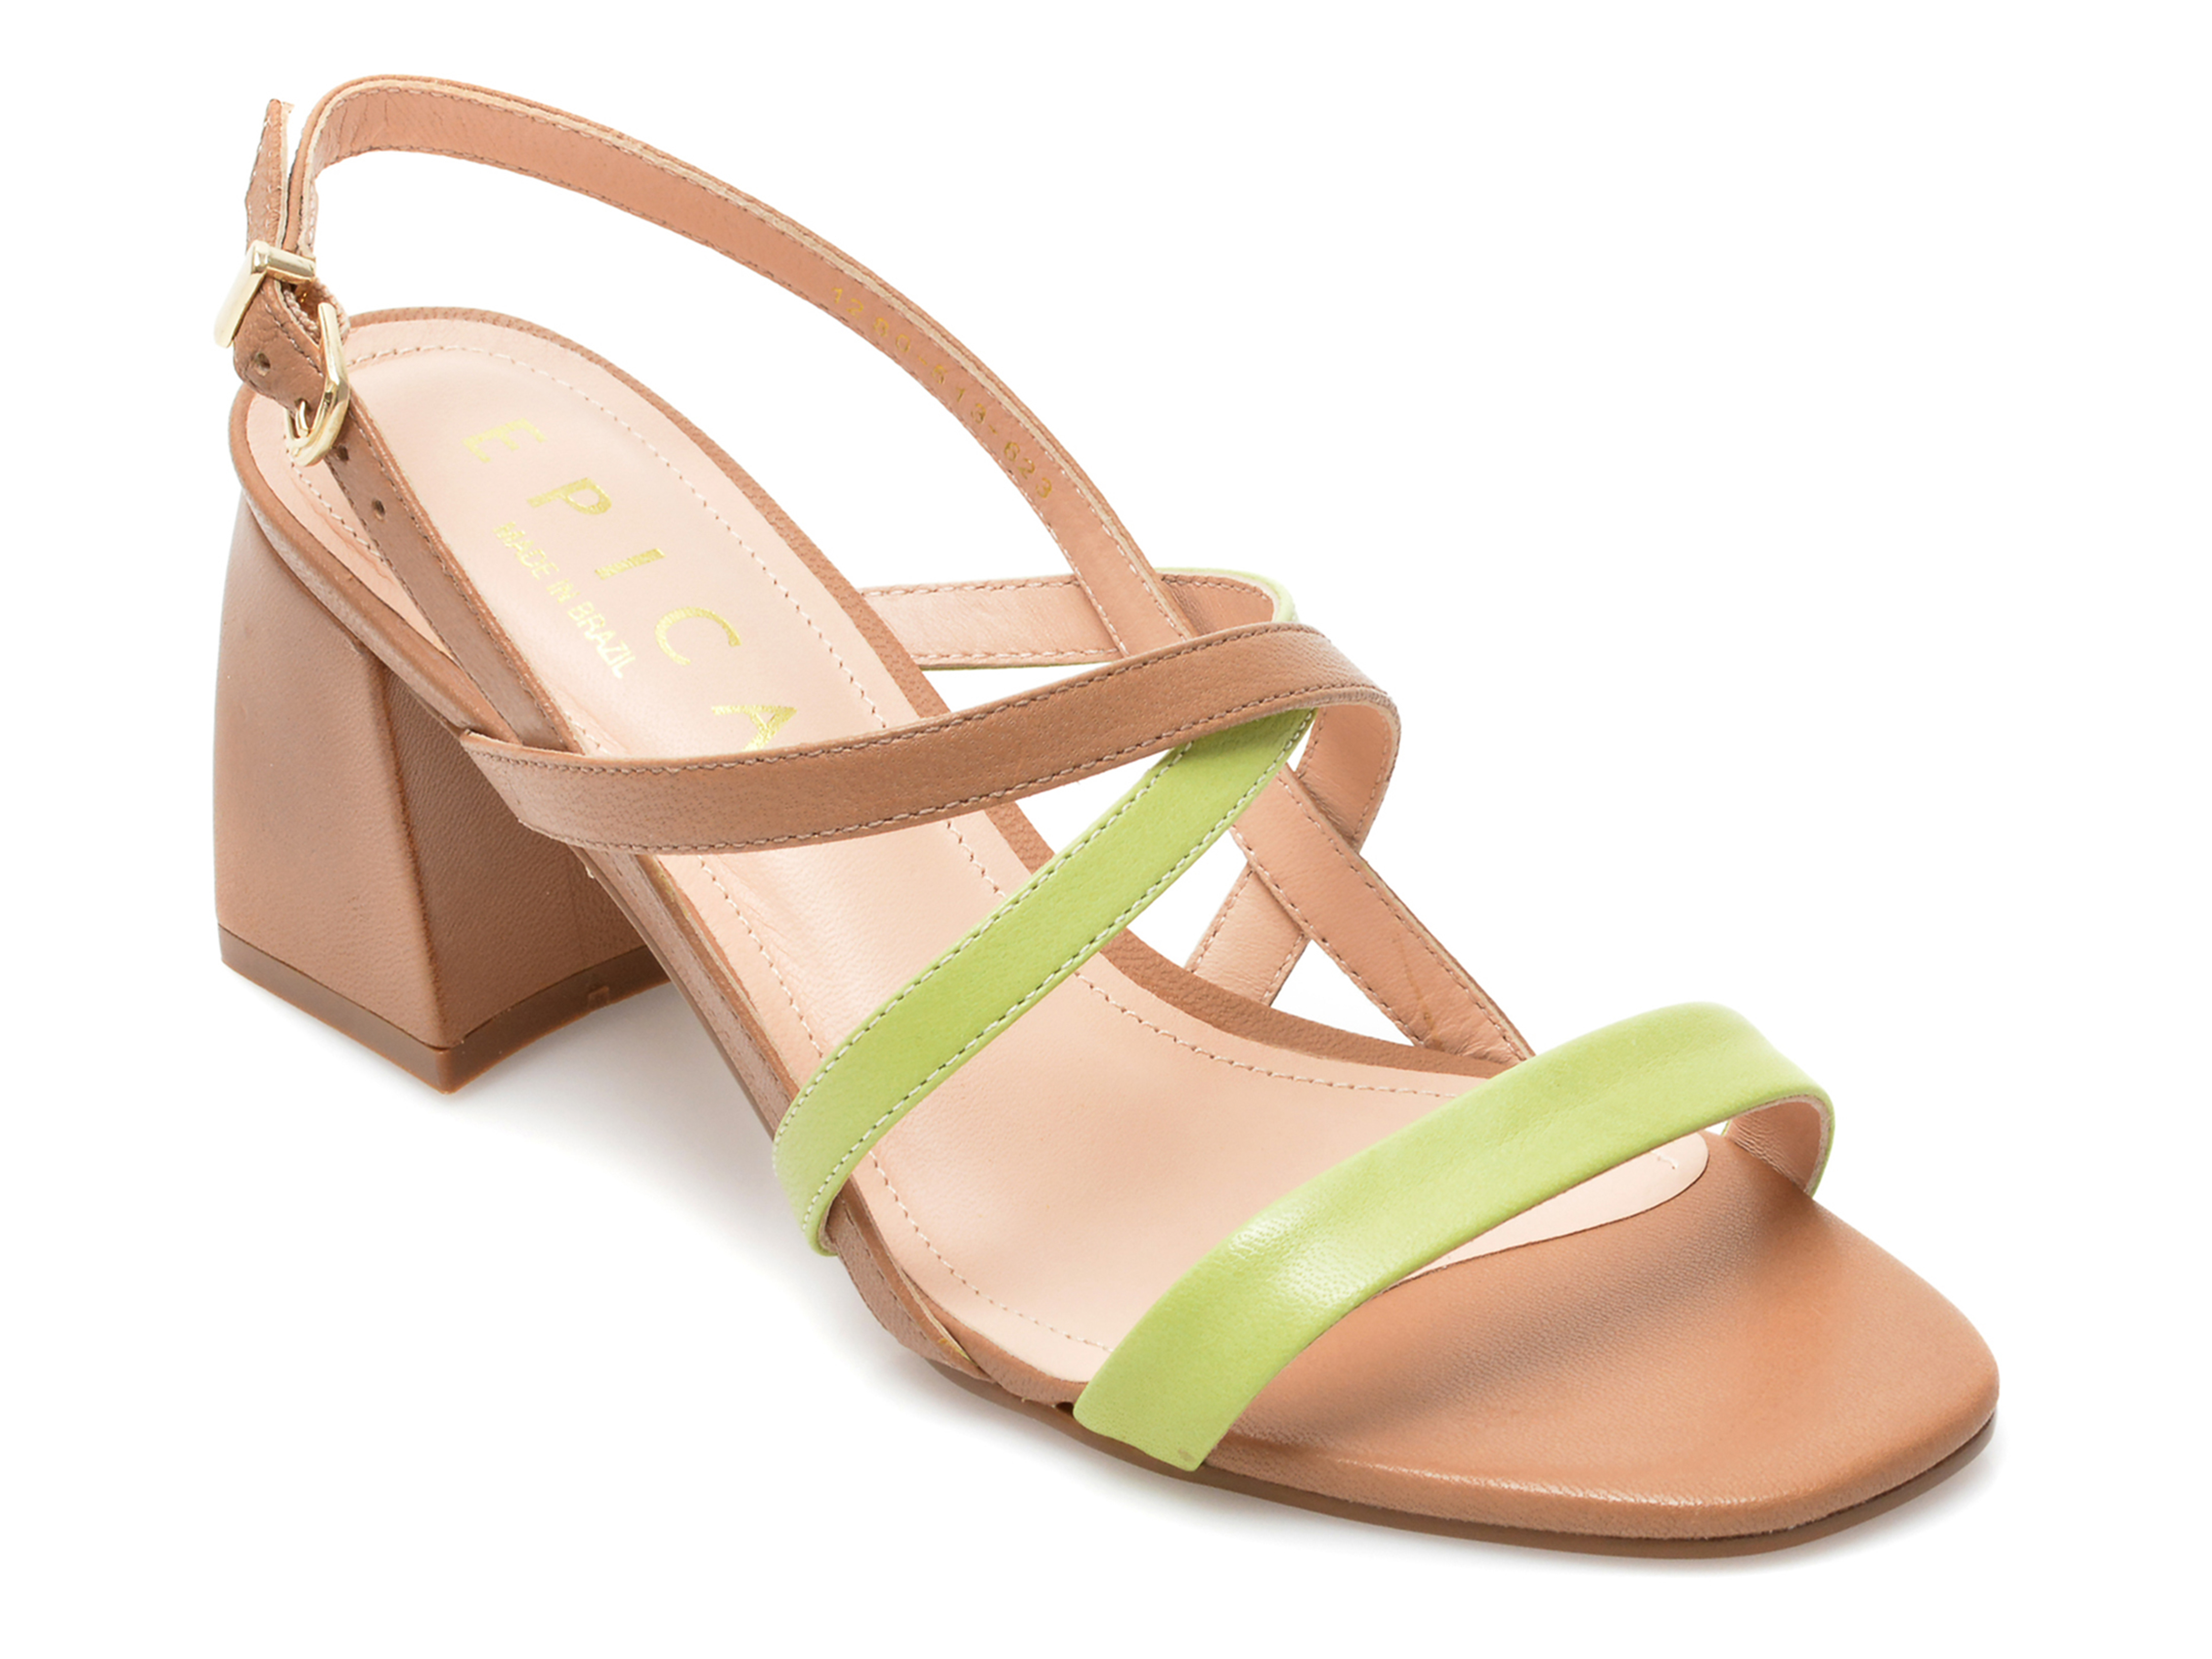 Sandale EPICA verde, 1280623, din piele naturala imagine otter.ro 2021